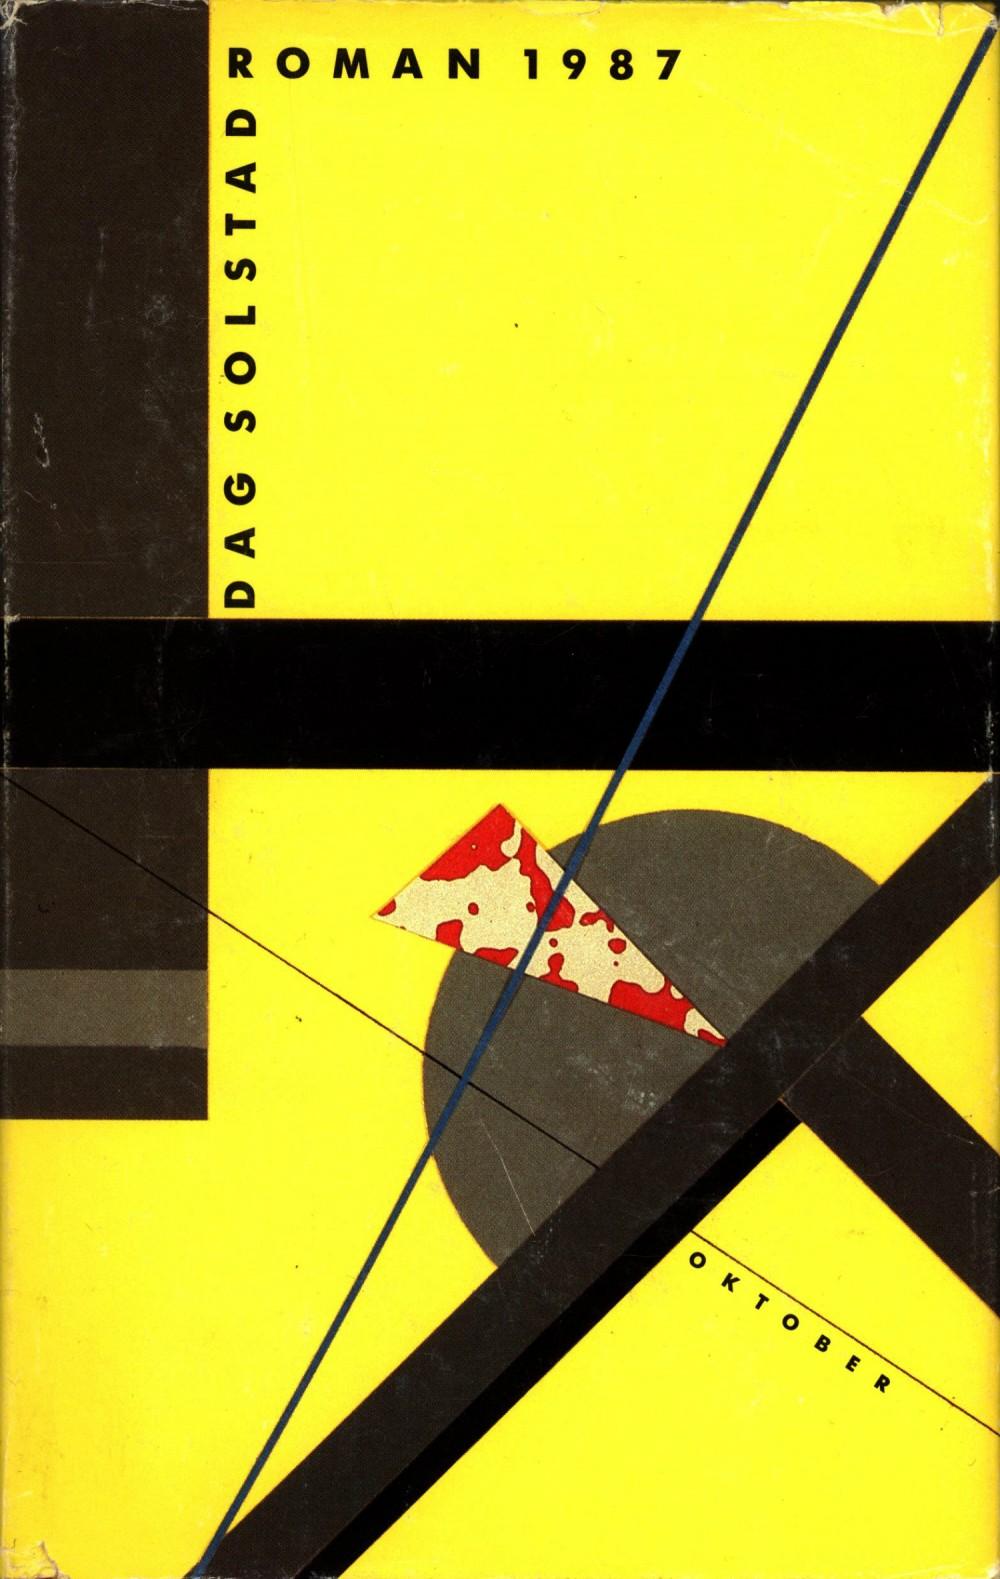 Dag Solstad: Roman 1987